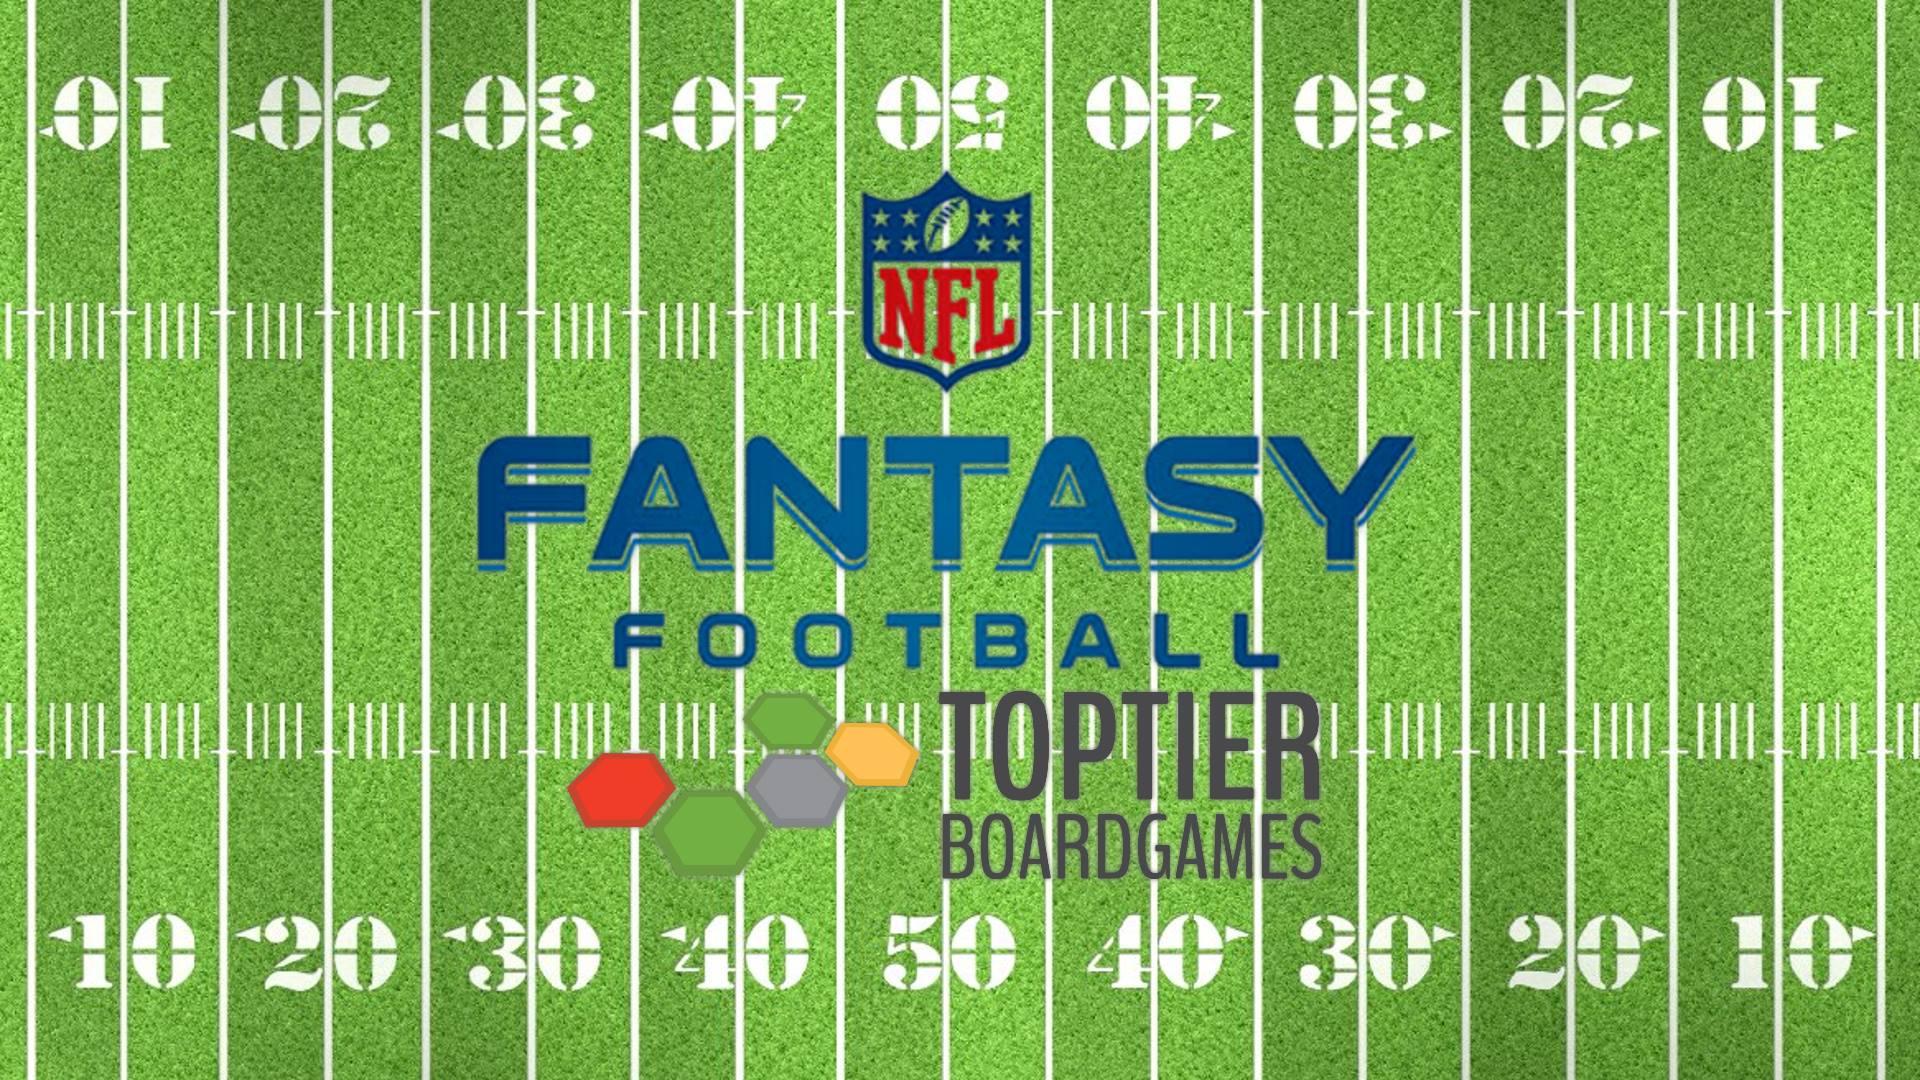 fantasy football event banner.jpg